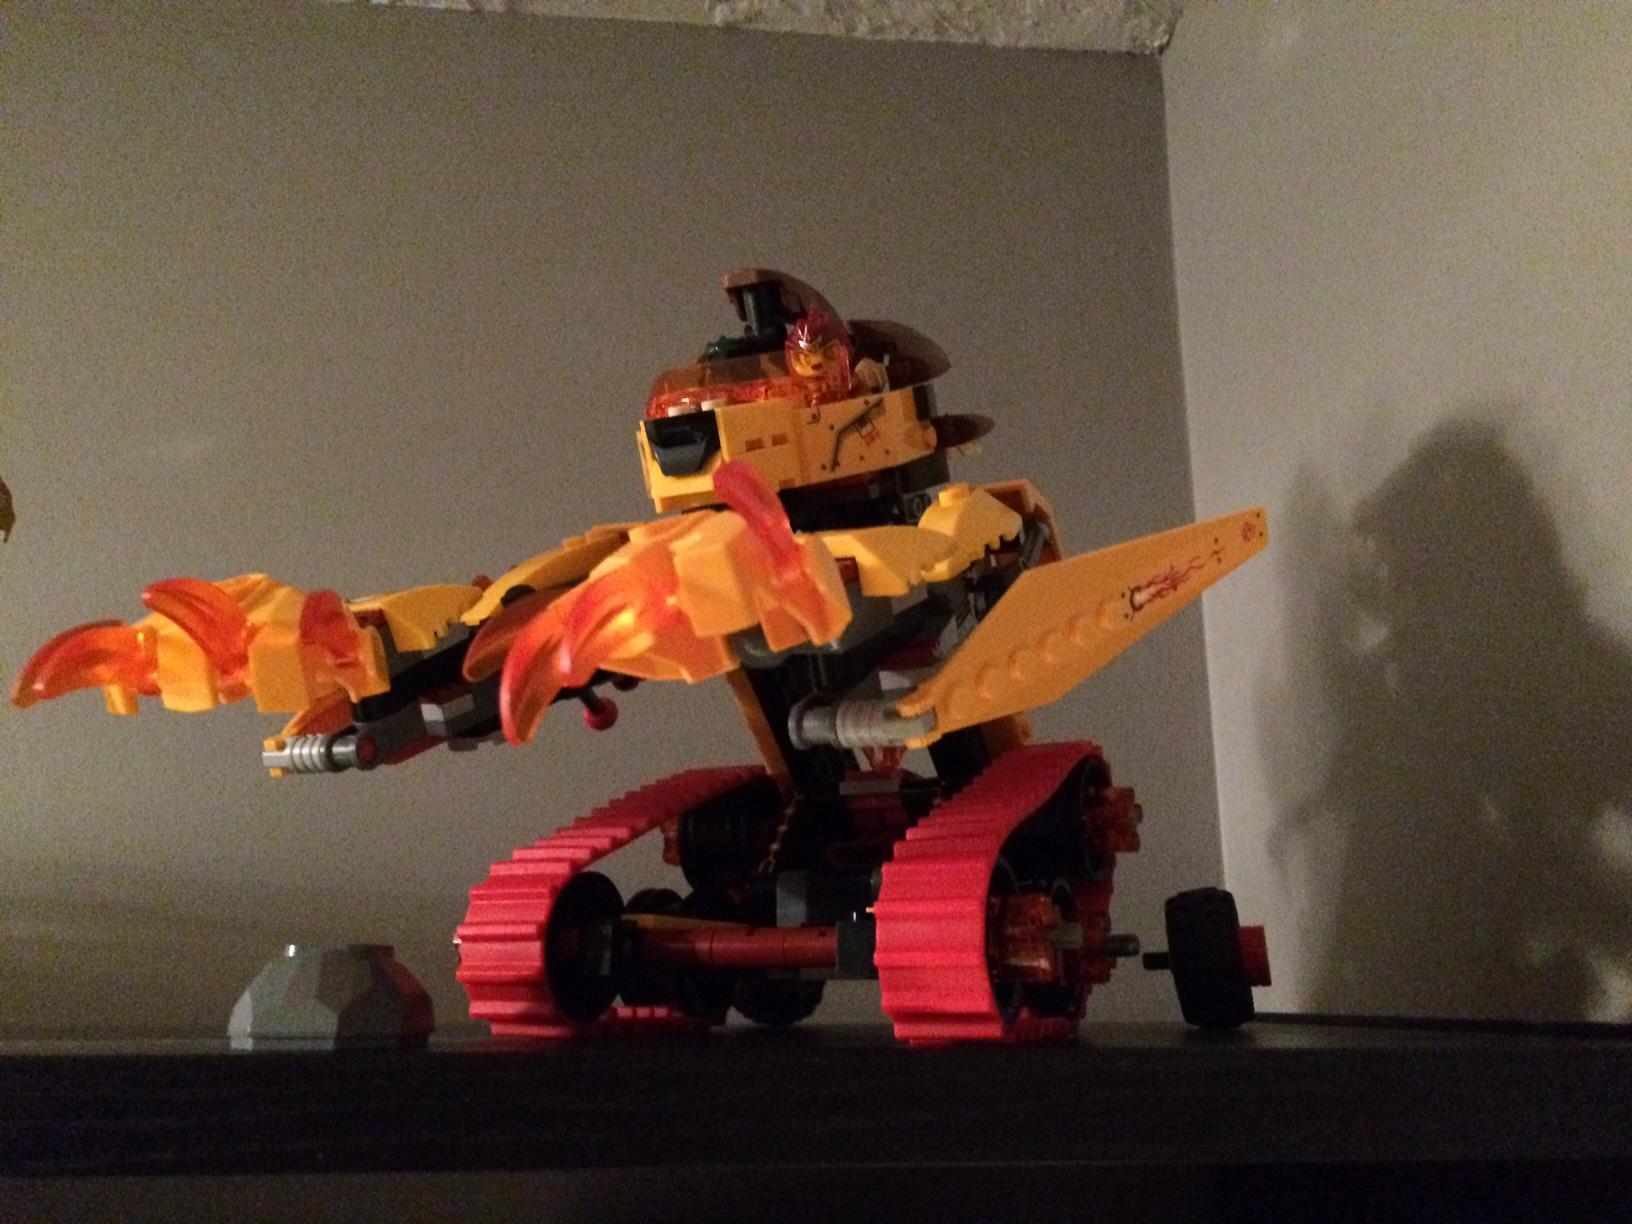 LEGO Chima Fire Lion